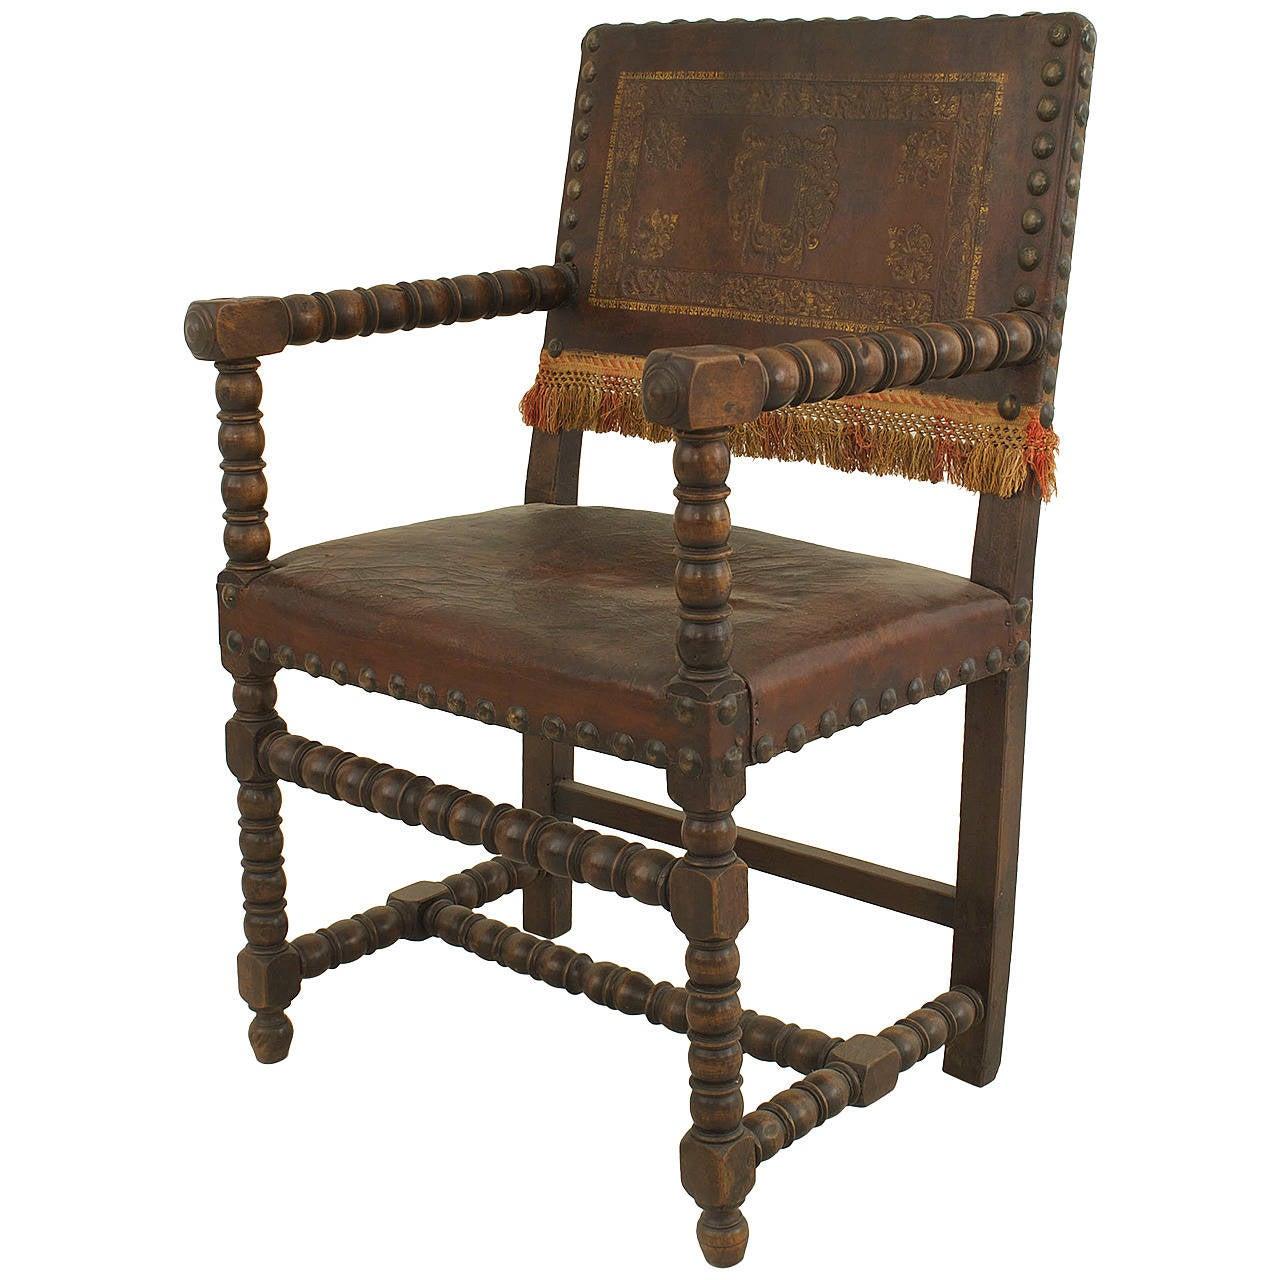 Italian Sofa Brent Cross: Late 18th Century Italian Renaissance Walnut And Leather